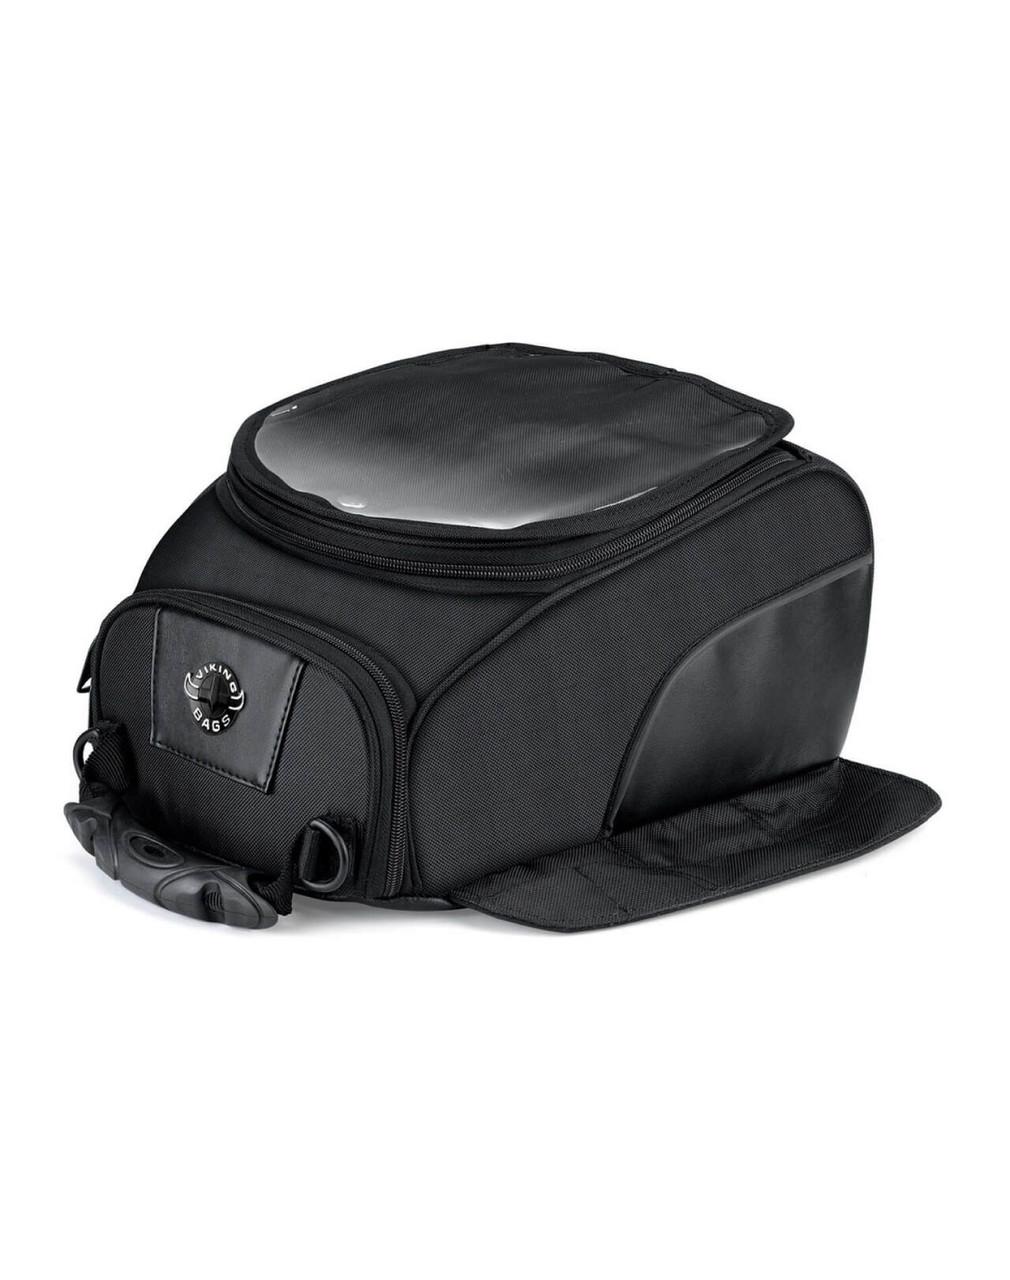 VikingBags 14 Large Yamaha Magnetic Motorcycle Tank Bag Main Bag View